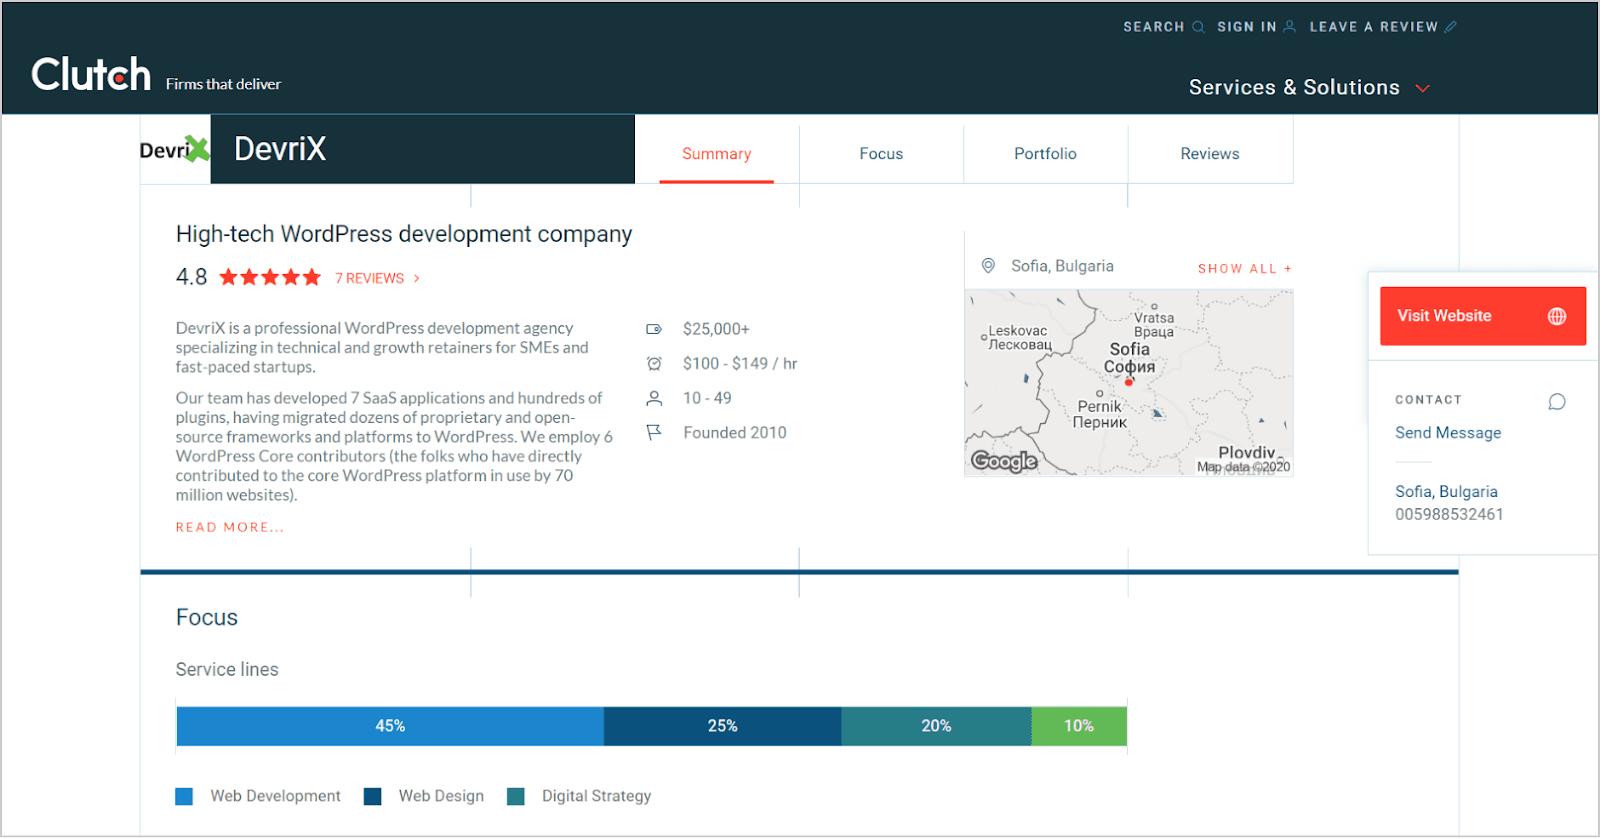 DevriX profile on the Clutch